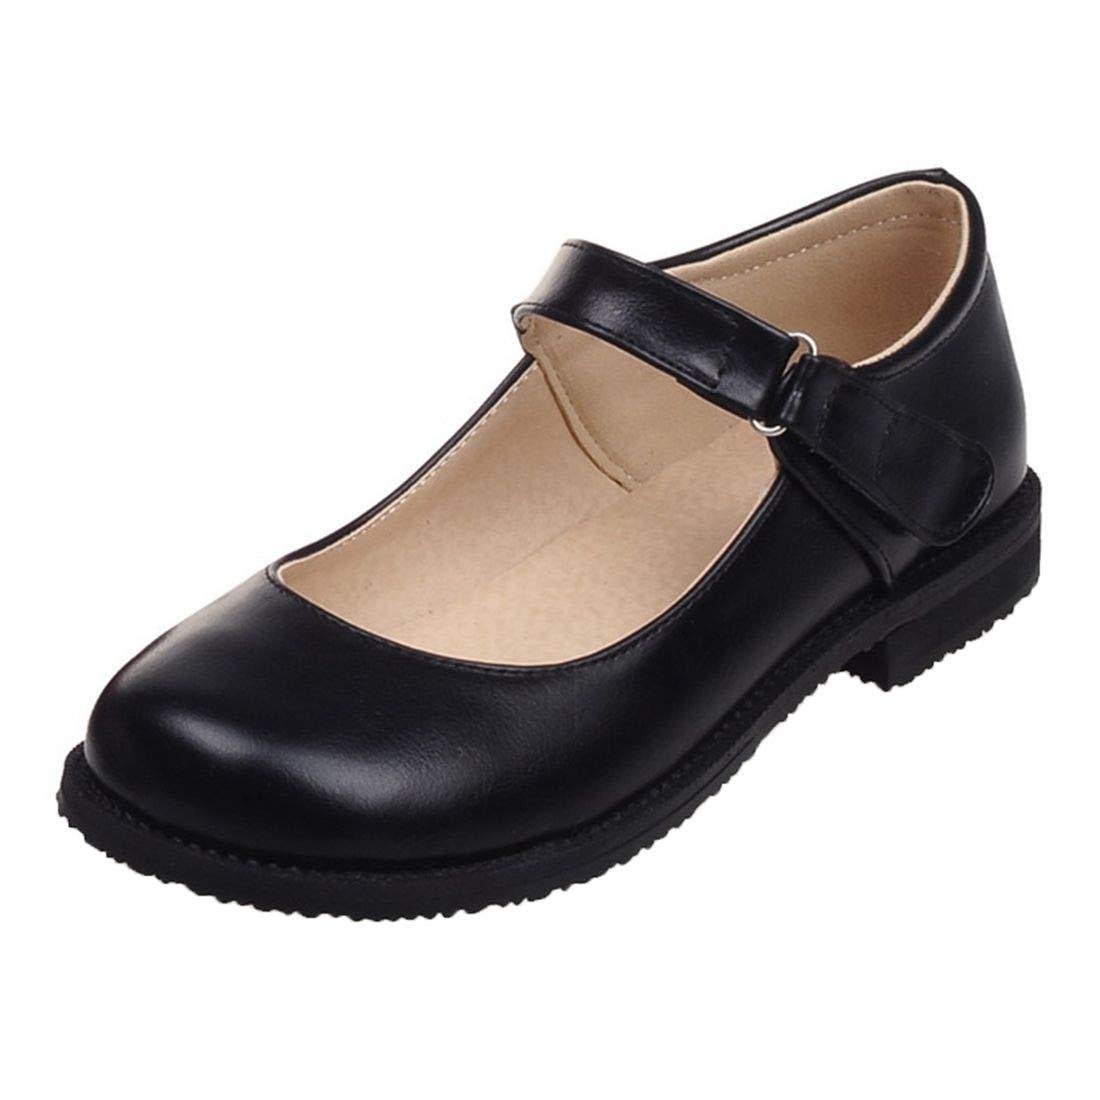 Vitalo Womens Round Toe Mary Jane Flats JK Uniform Dress Shoes Size 8.5 B(M) US,1 Black by Vitalo